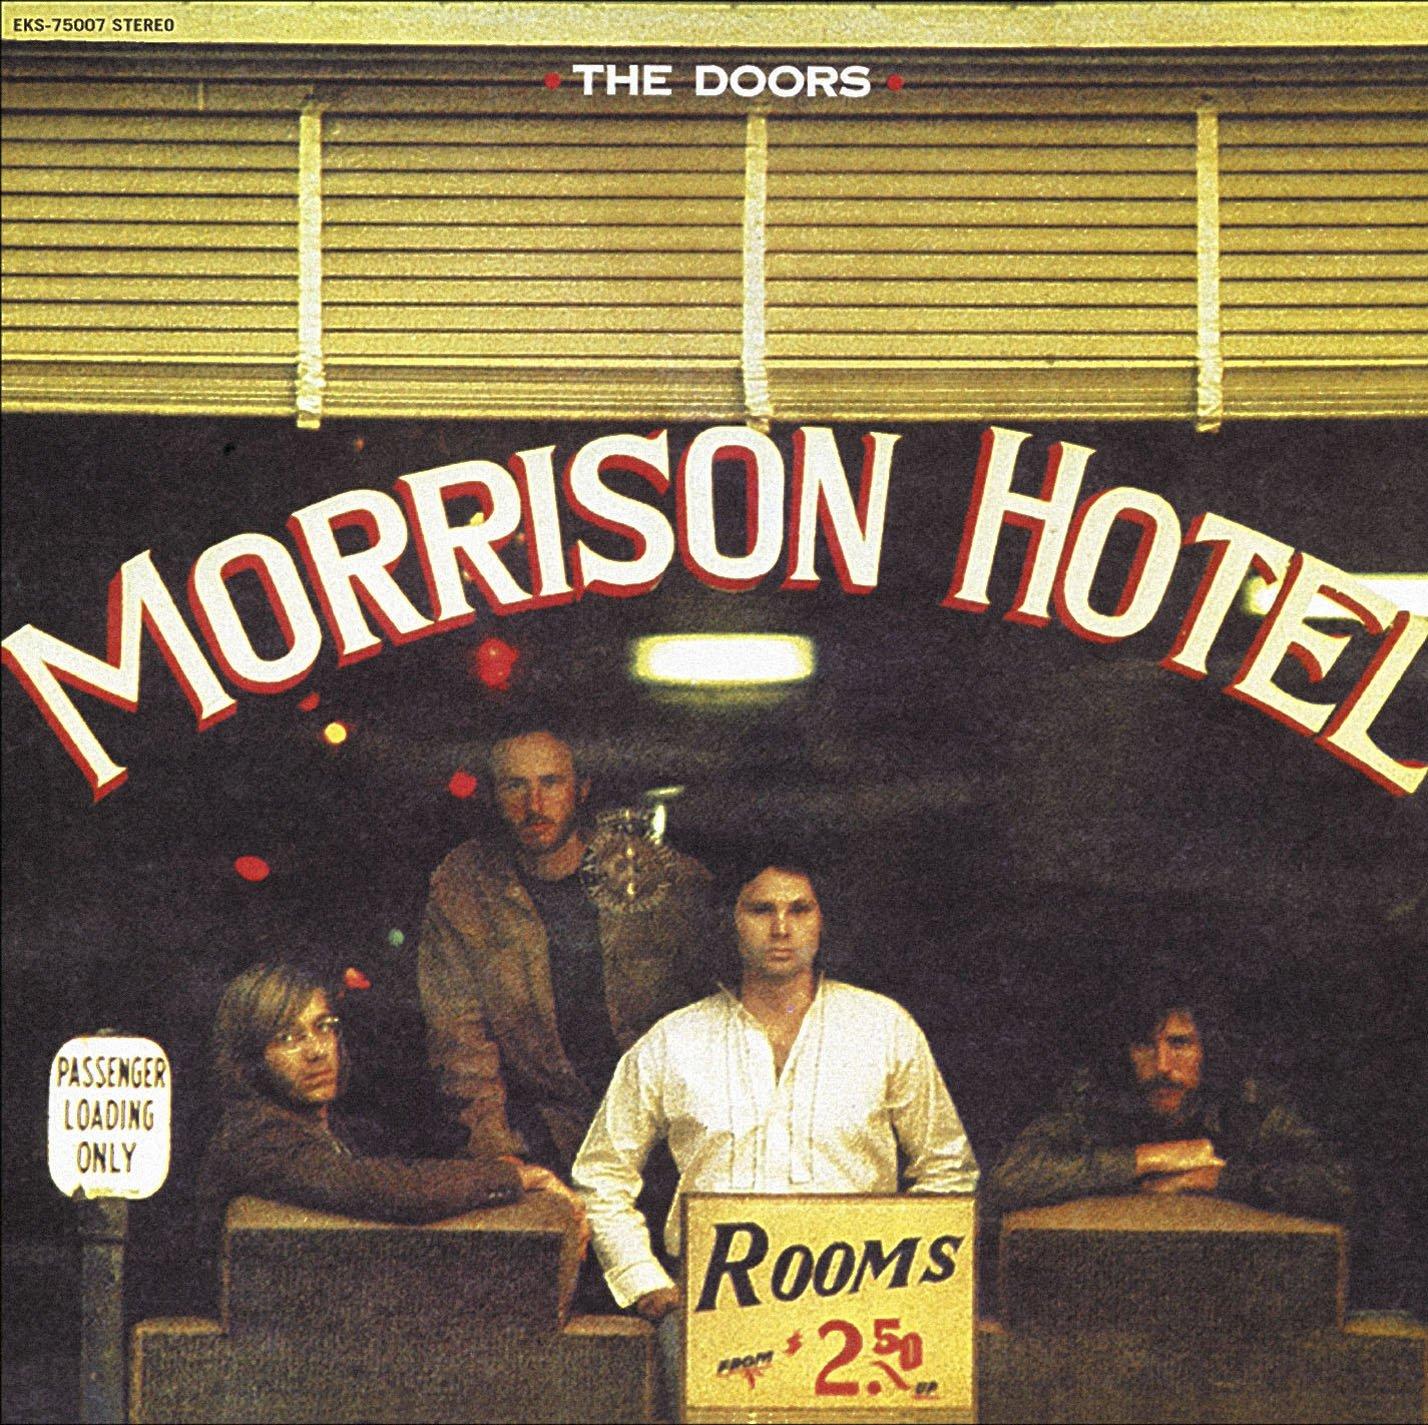 The Doors – Morrison Hotel (1991) [FLAC]